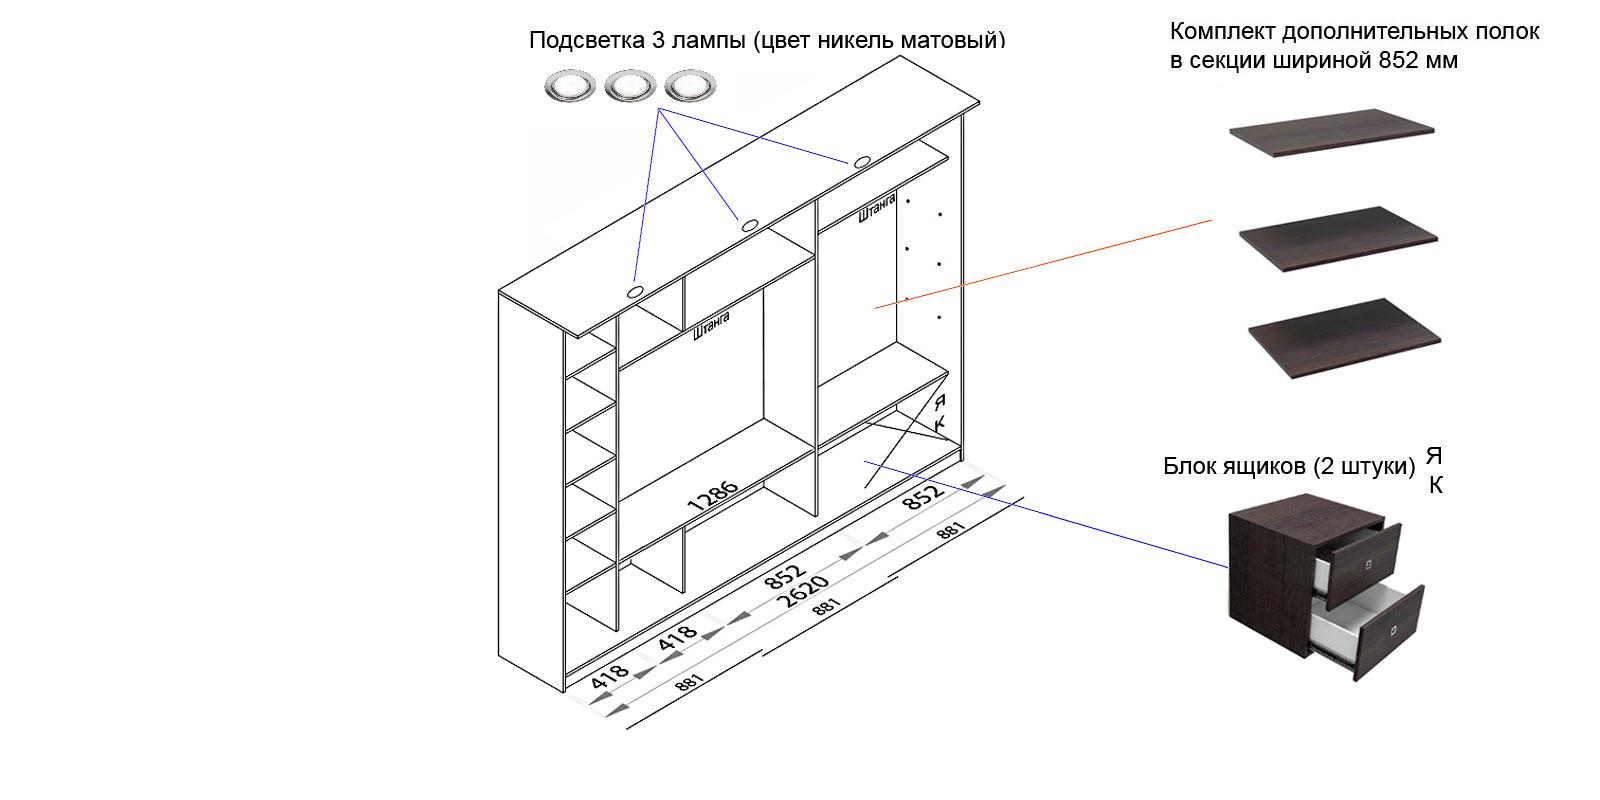 Шкаф-купе трехдверный Манчестер 260 см (дуб феррара/дуб сонома) от HomeMe.ru